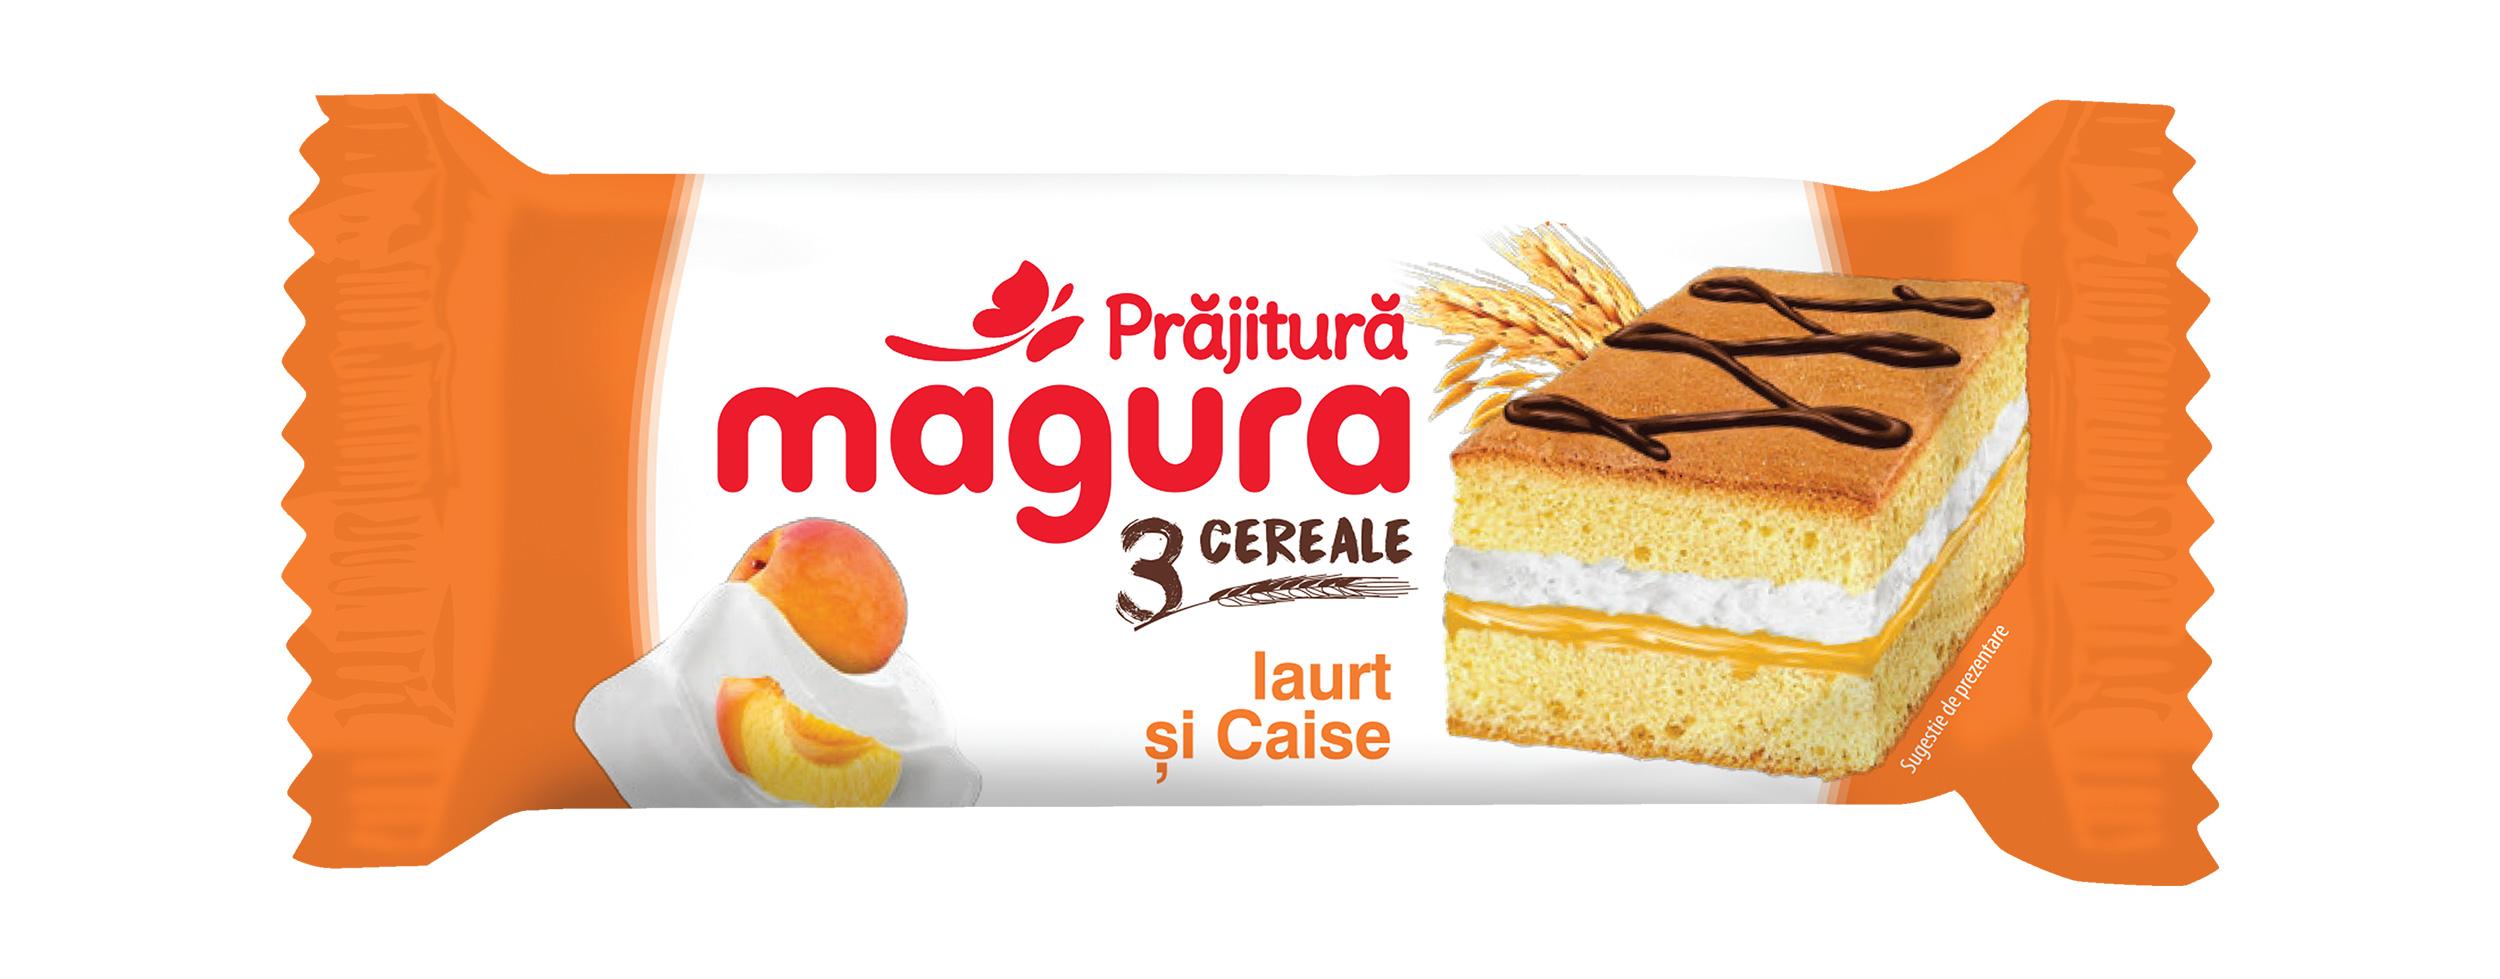 Magura 3 Cereale, Crema Iaurt & Caise 24x30g